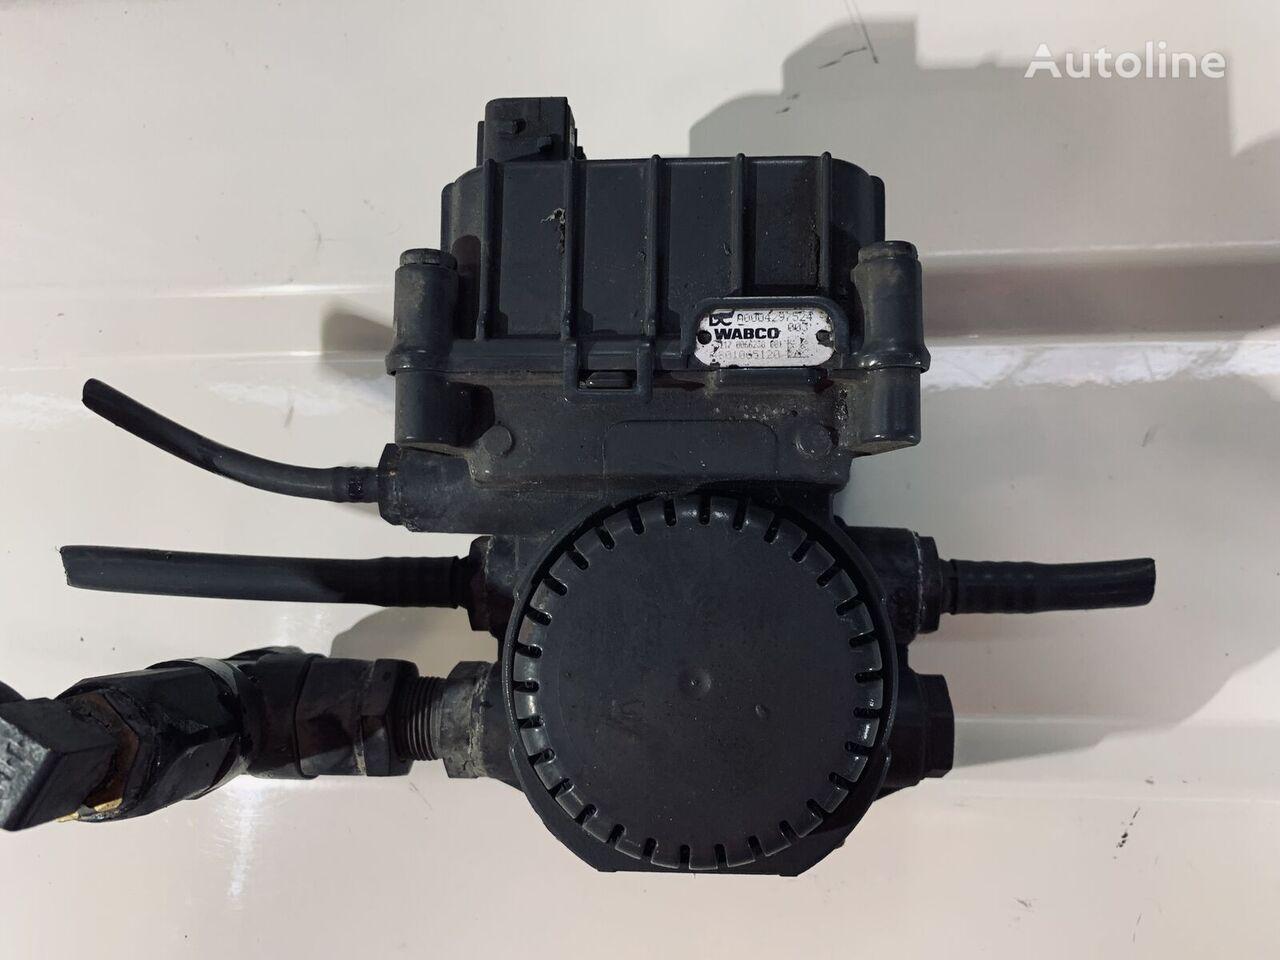 MERCEDES-BENZ (WABCO) EBS modulator for MERCEDES-BENZ ACTROS tractor unit